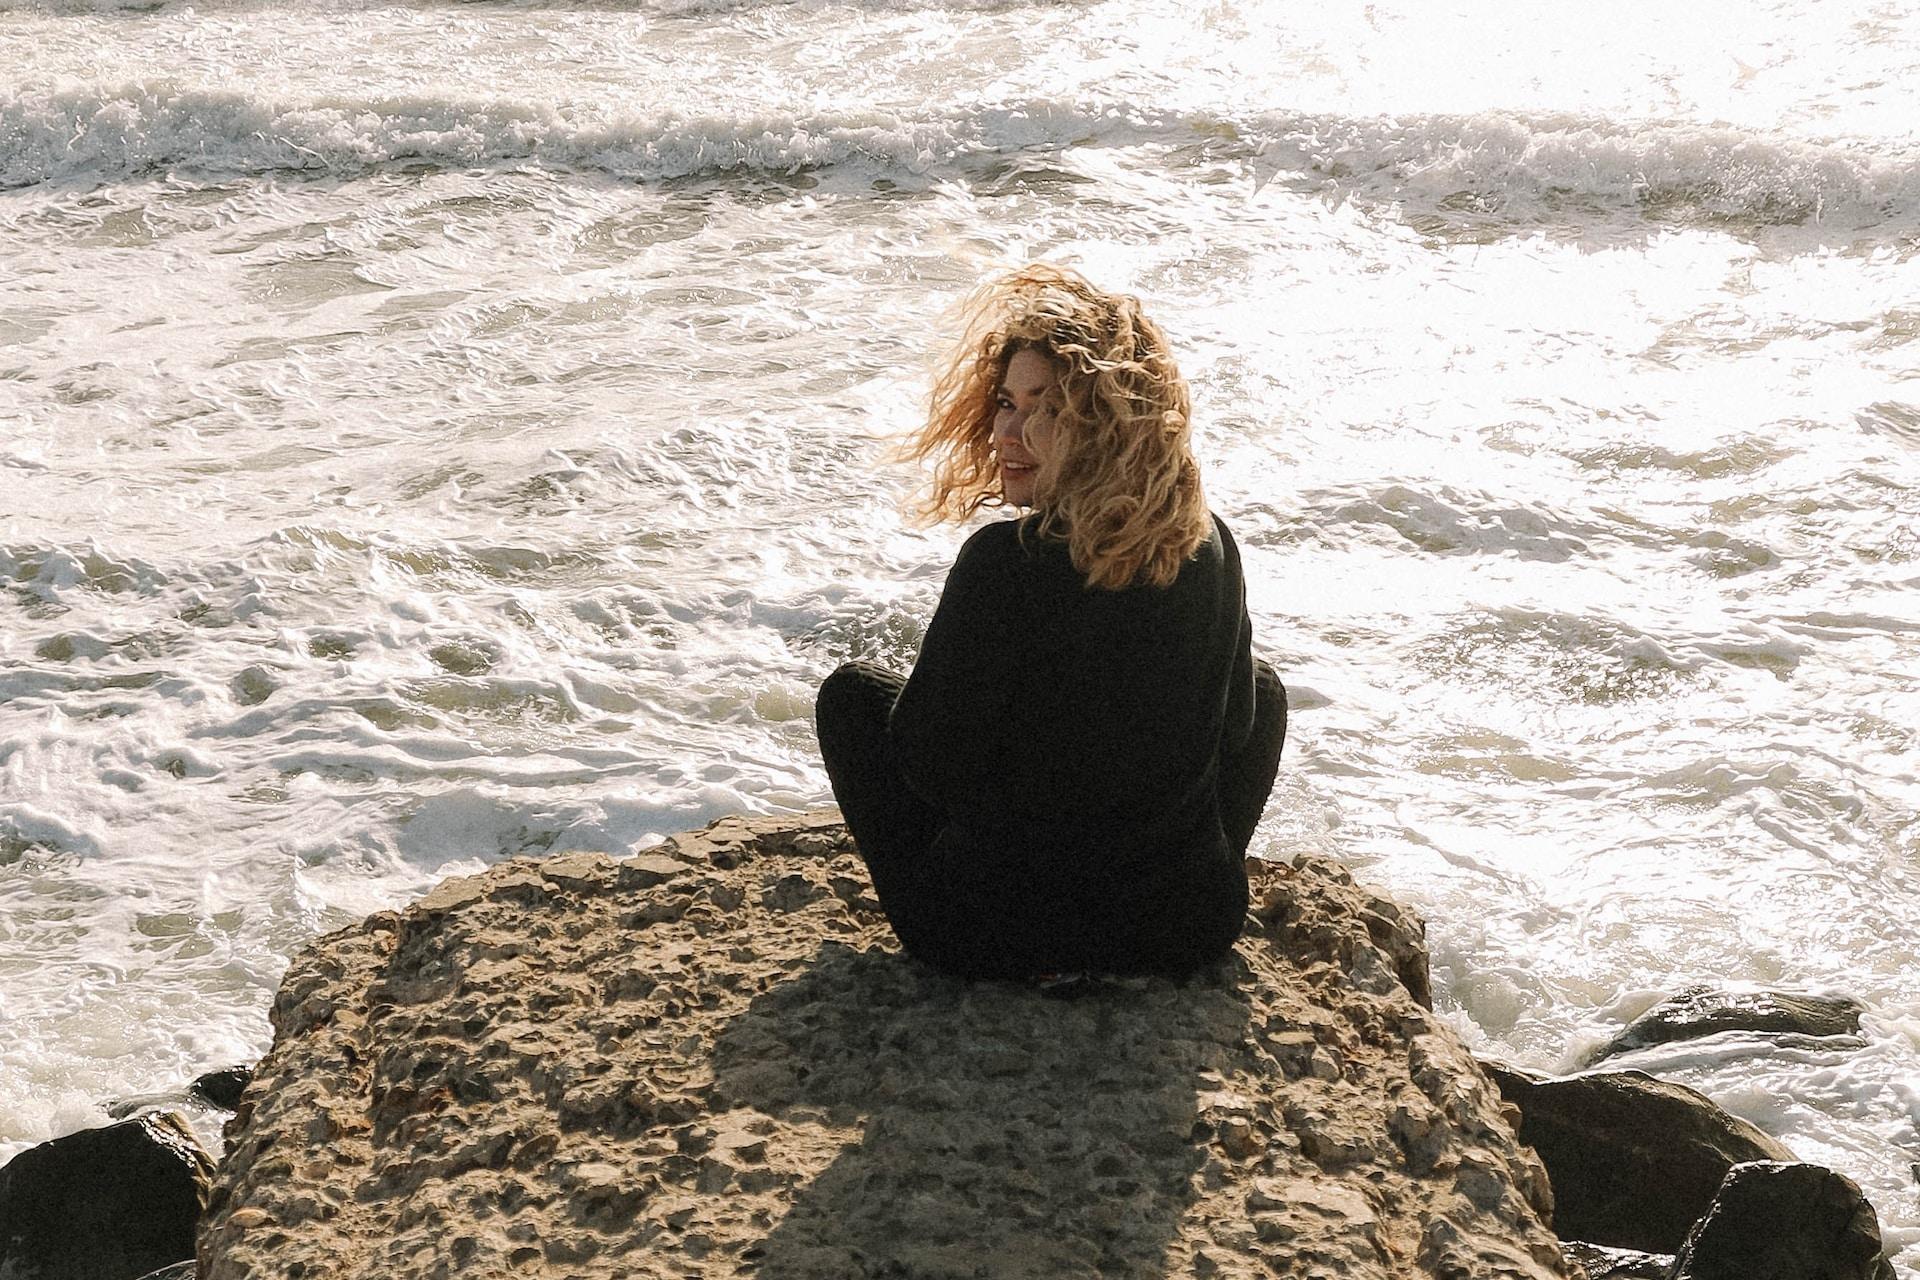 woman in black long sleeve shirt sitting on brown rock near sea during daytime